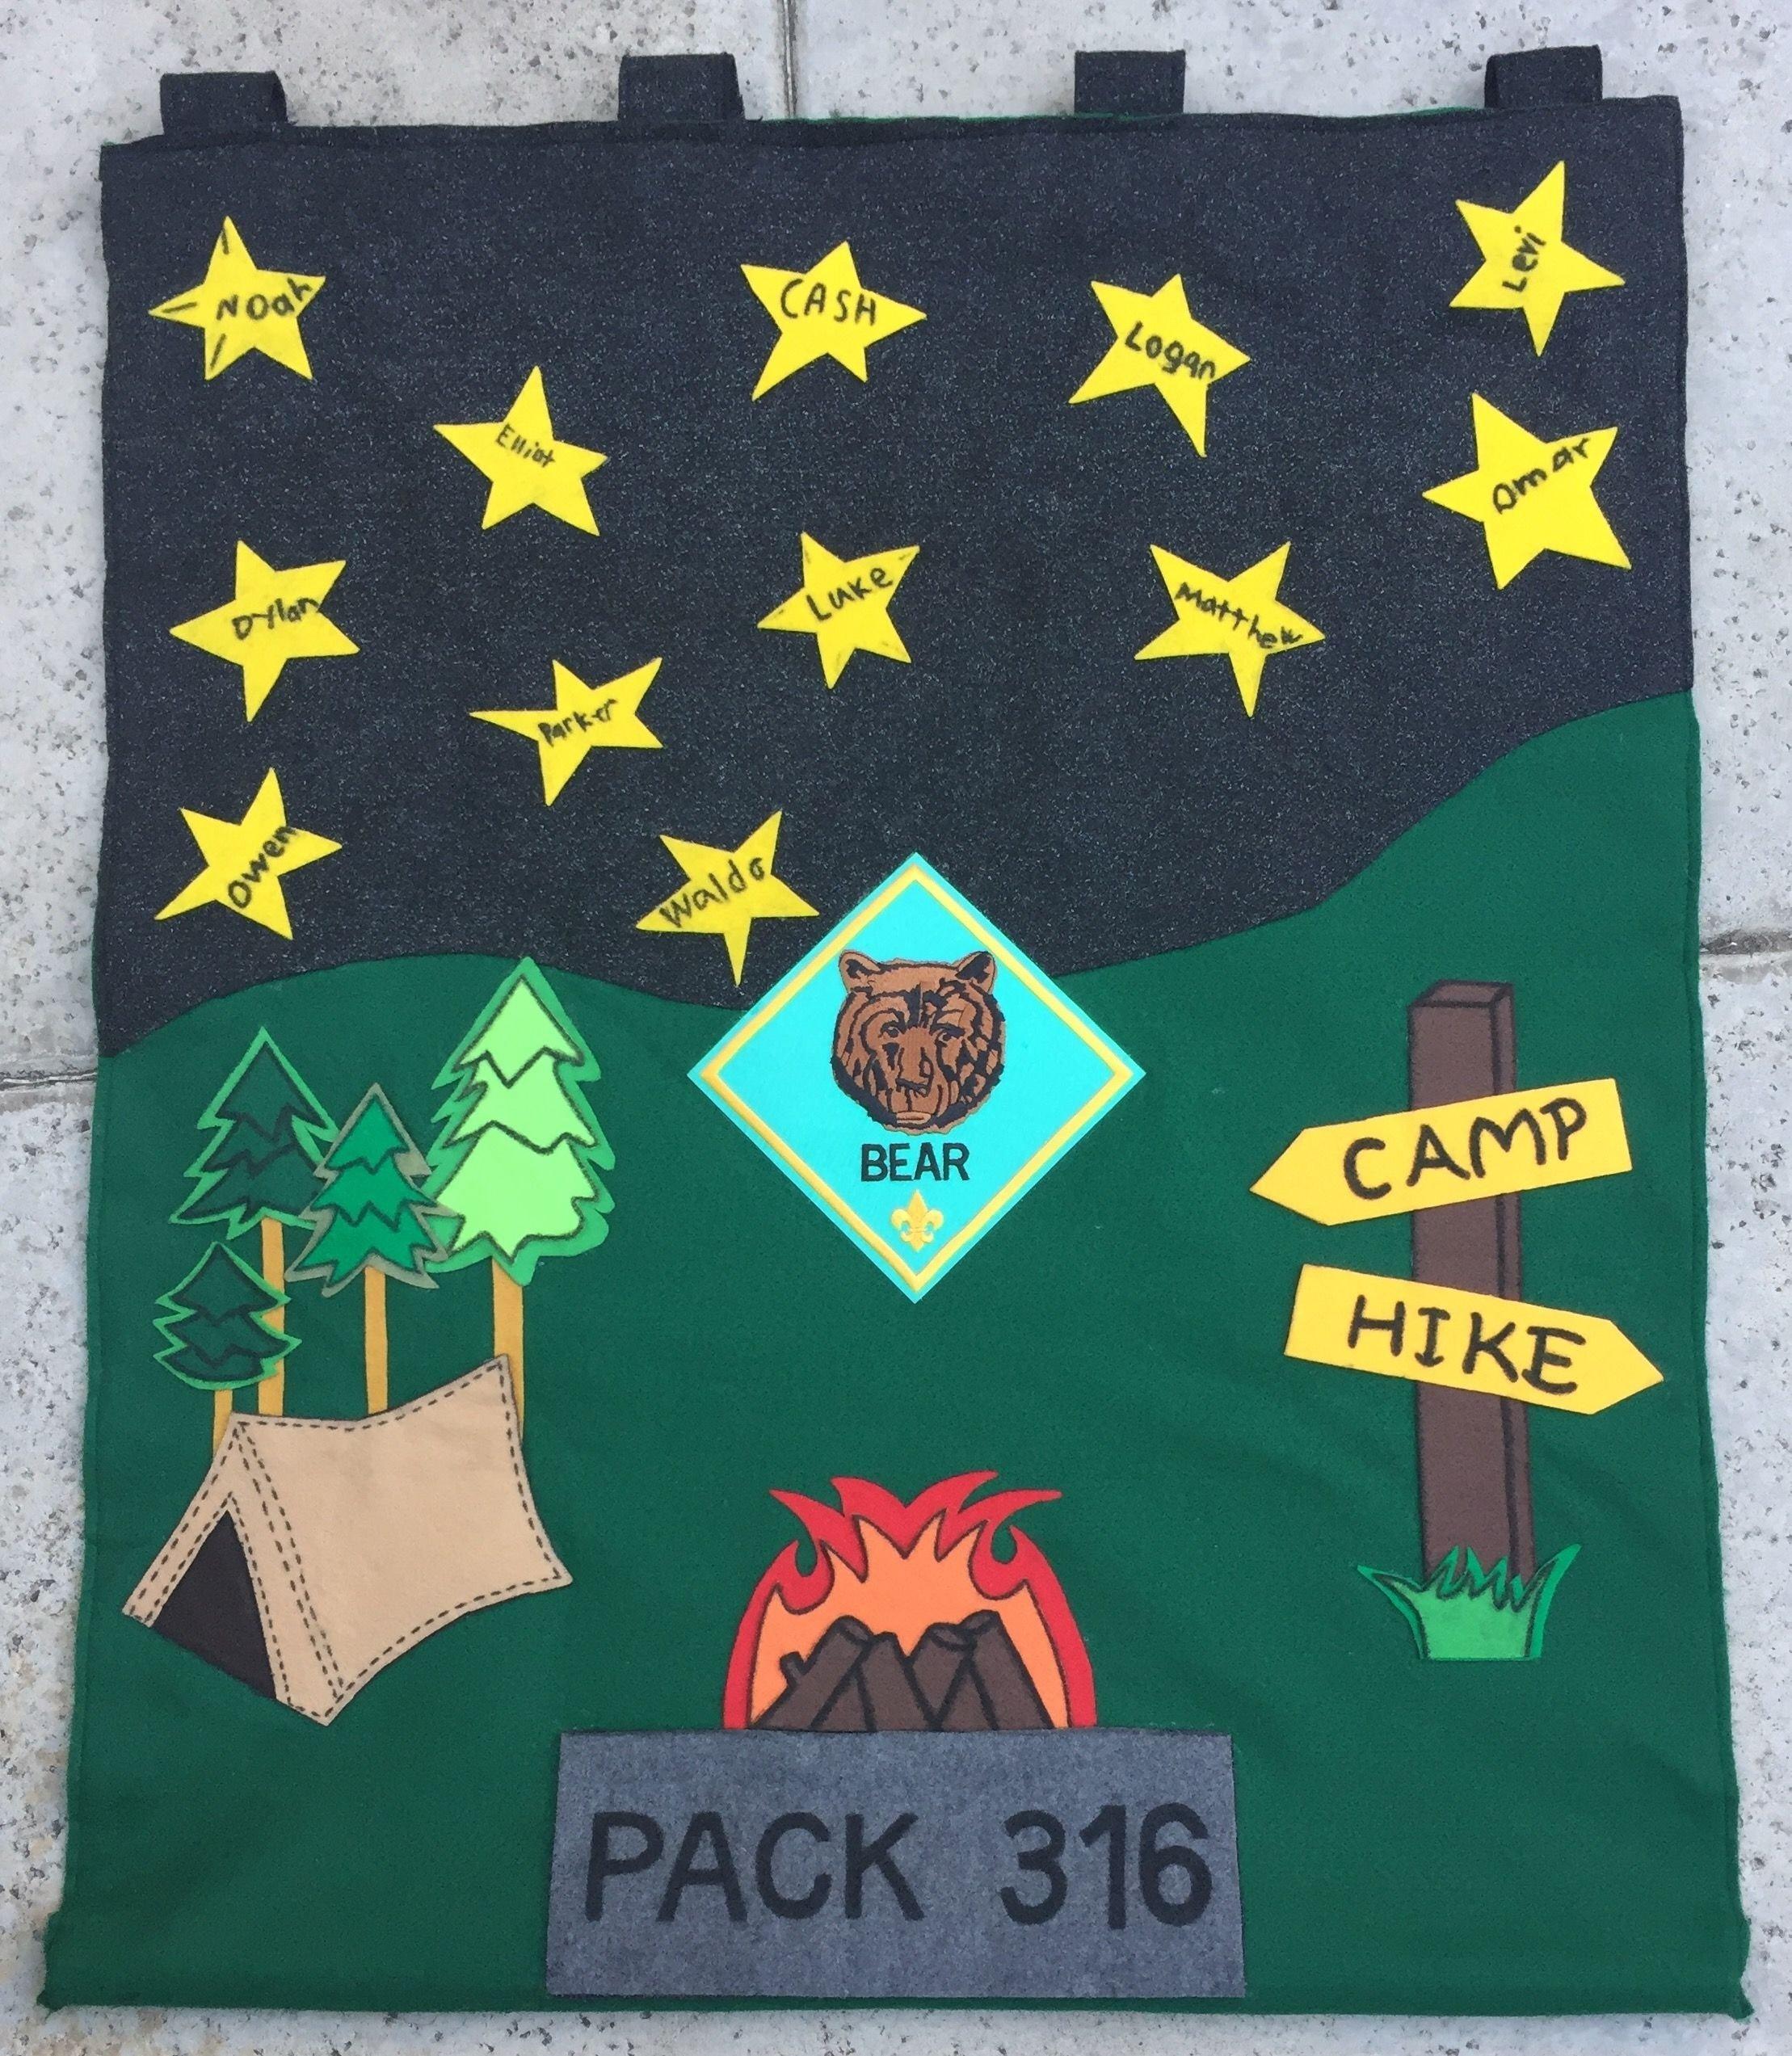 10 Pretty Cub Scout Den Flag Ideas bear den flag idea pack316 cccmpack316 teamsimmons proudscoutmom 2021